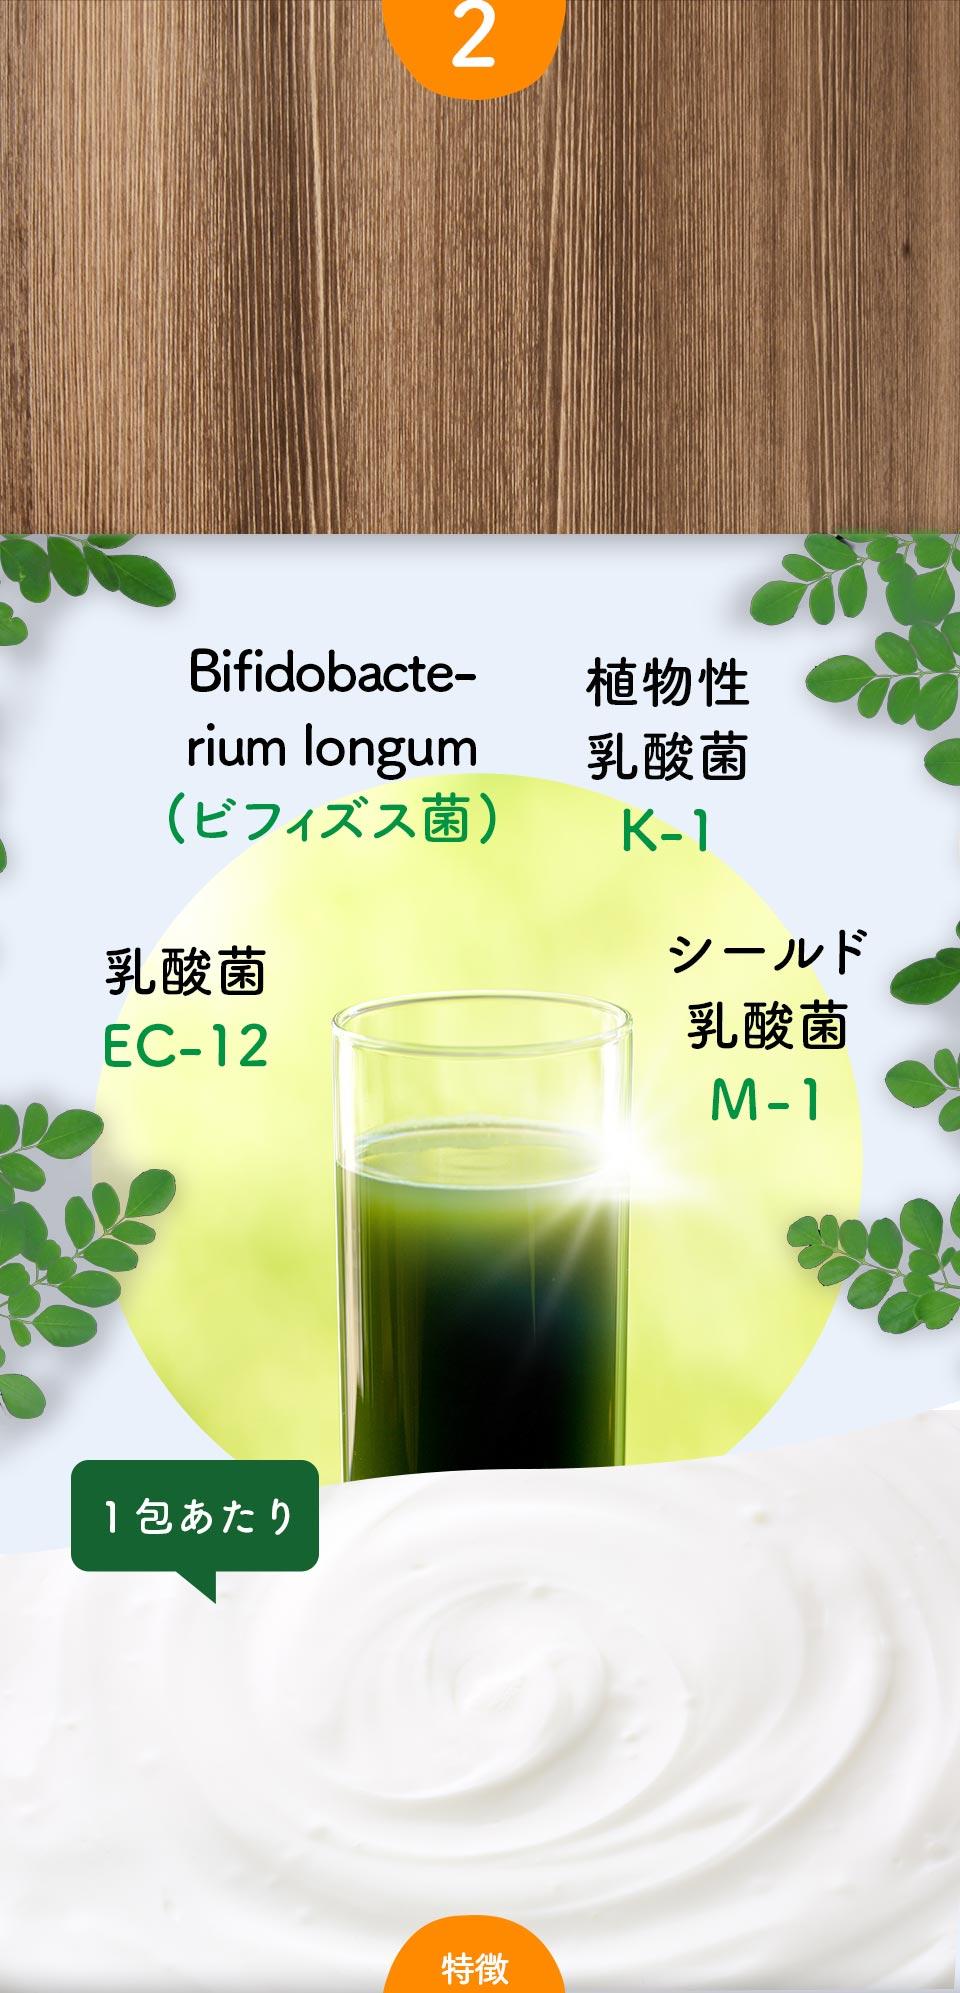 Bifidobacte- rium longum (ビフィズス菌)、植物性乳酸菌K-1、乳酸菌EC-12、シールド乳酸菌 M-1、1包あたり1000億個の3種の乳酸菌と10億個のビフィズス菌が環境をサポート